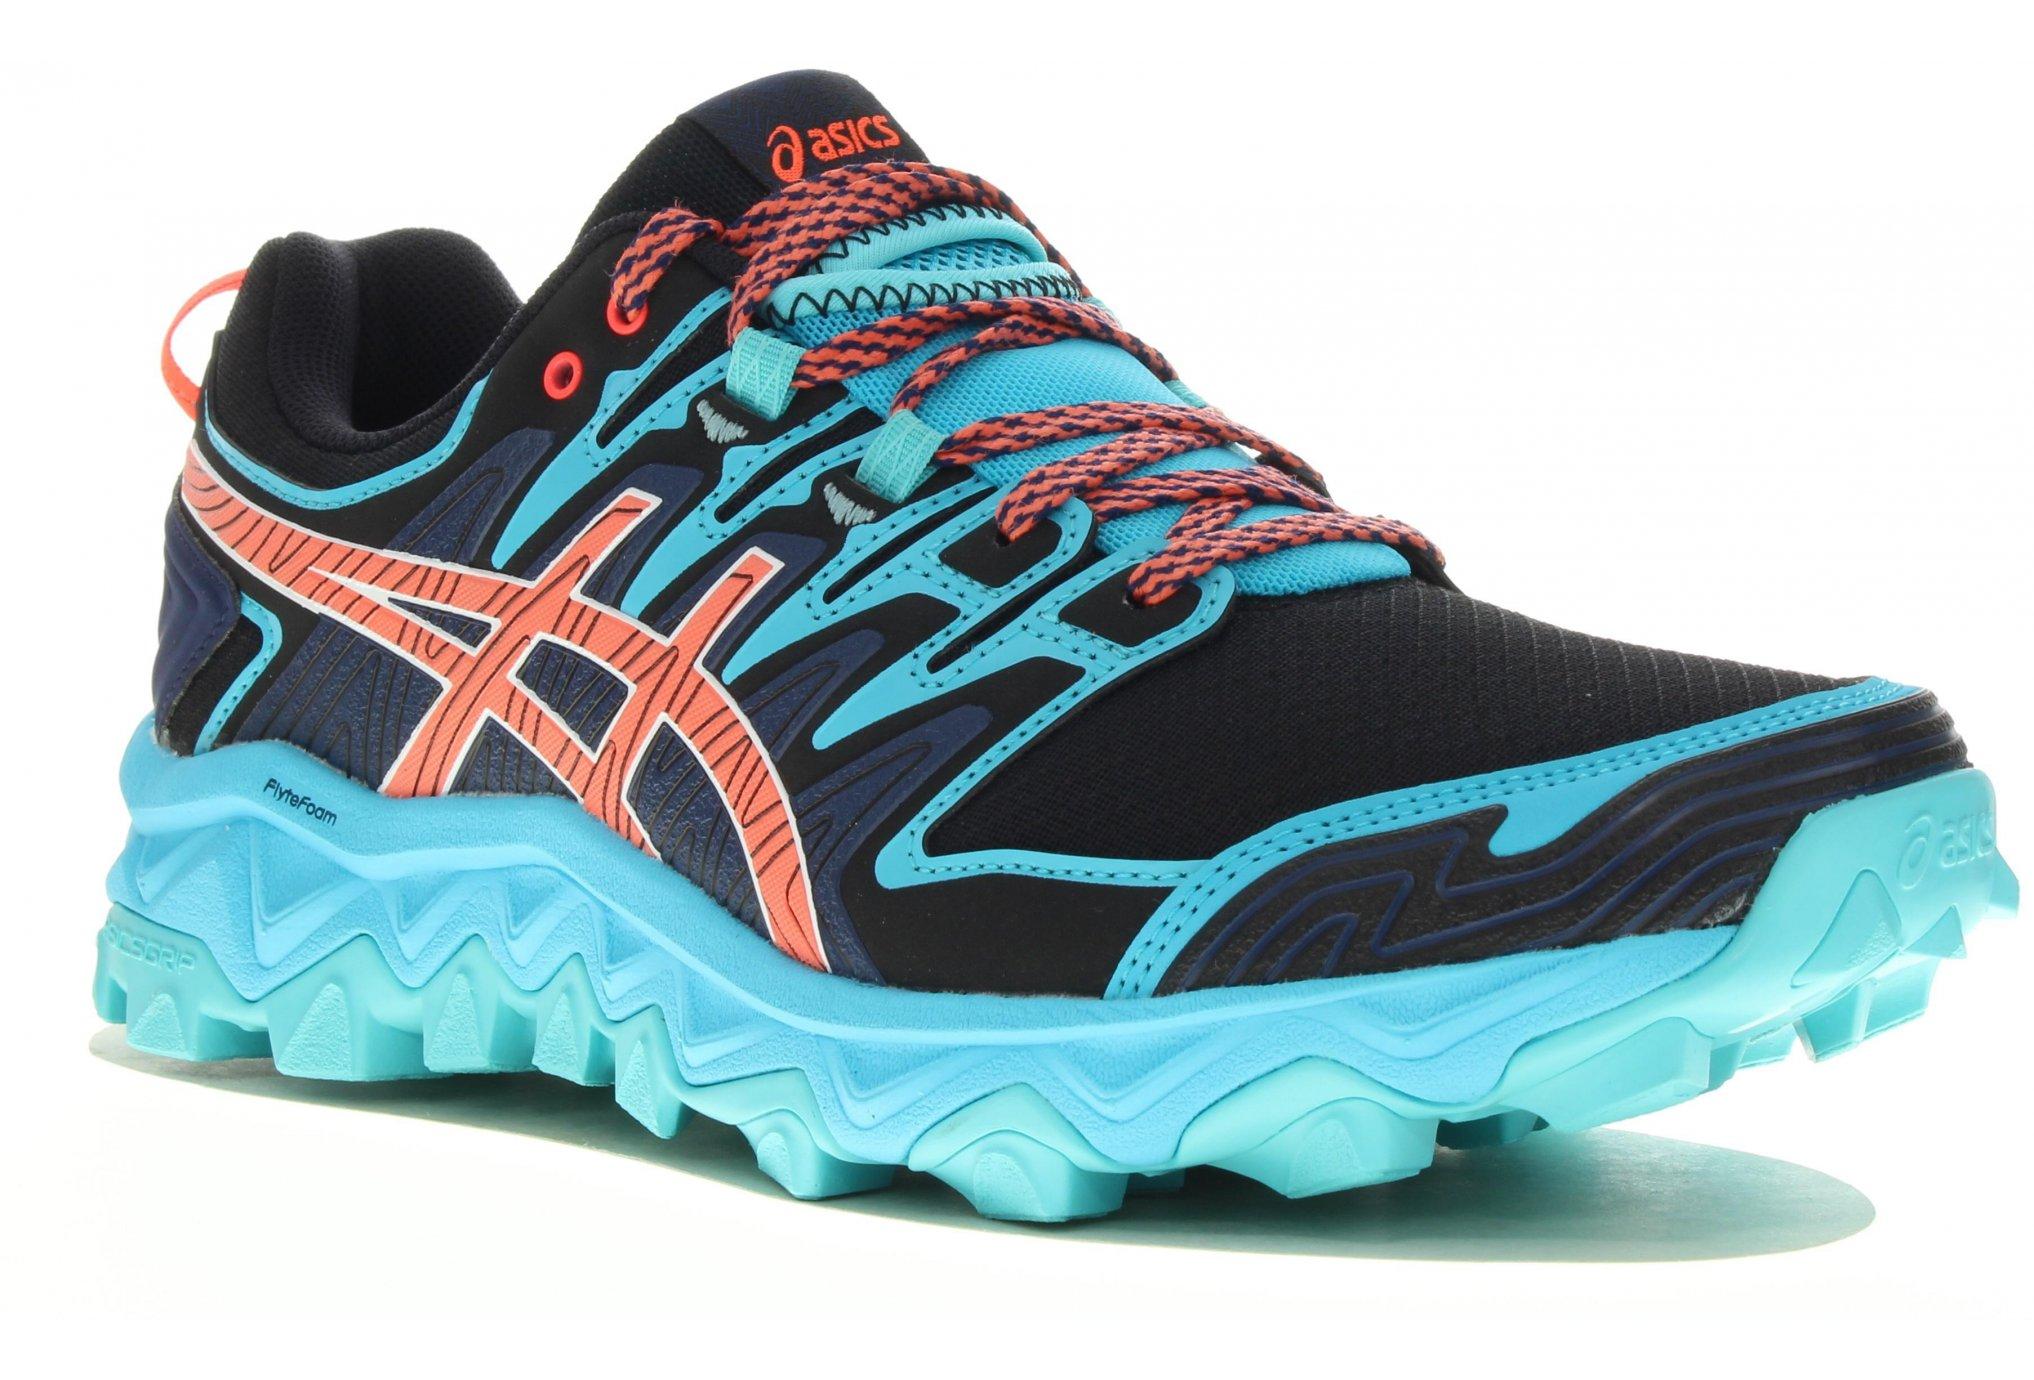 Asics Gel-Fuji Trabuco 7 Chaussures running femme